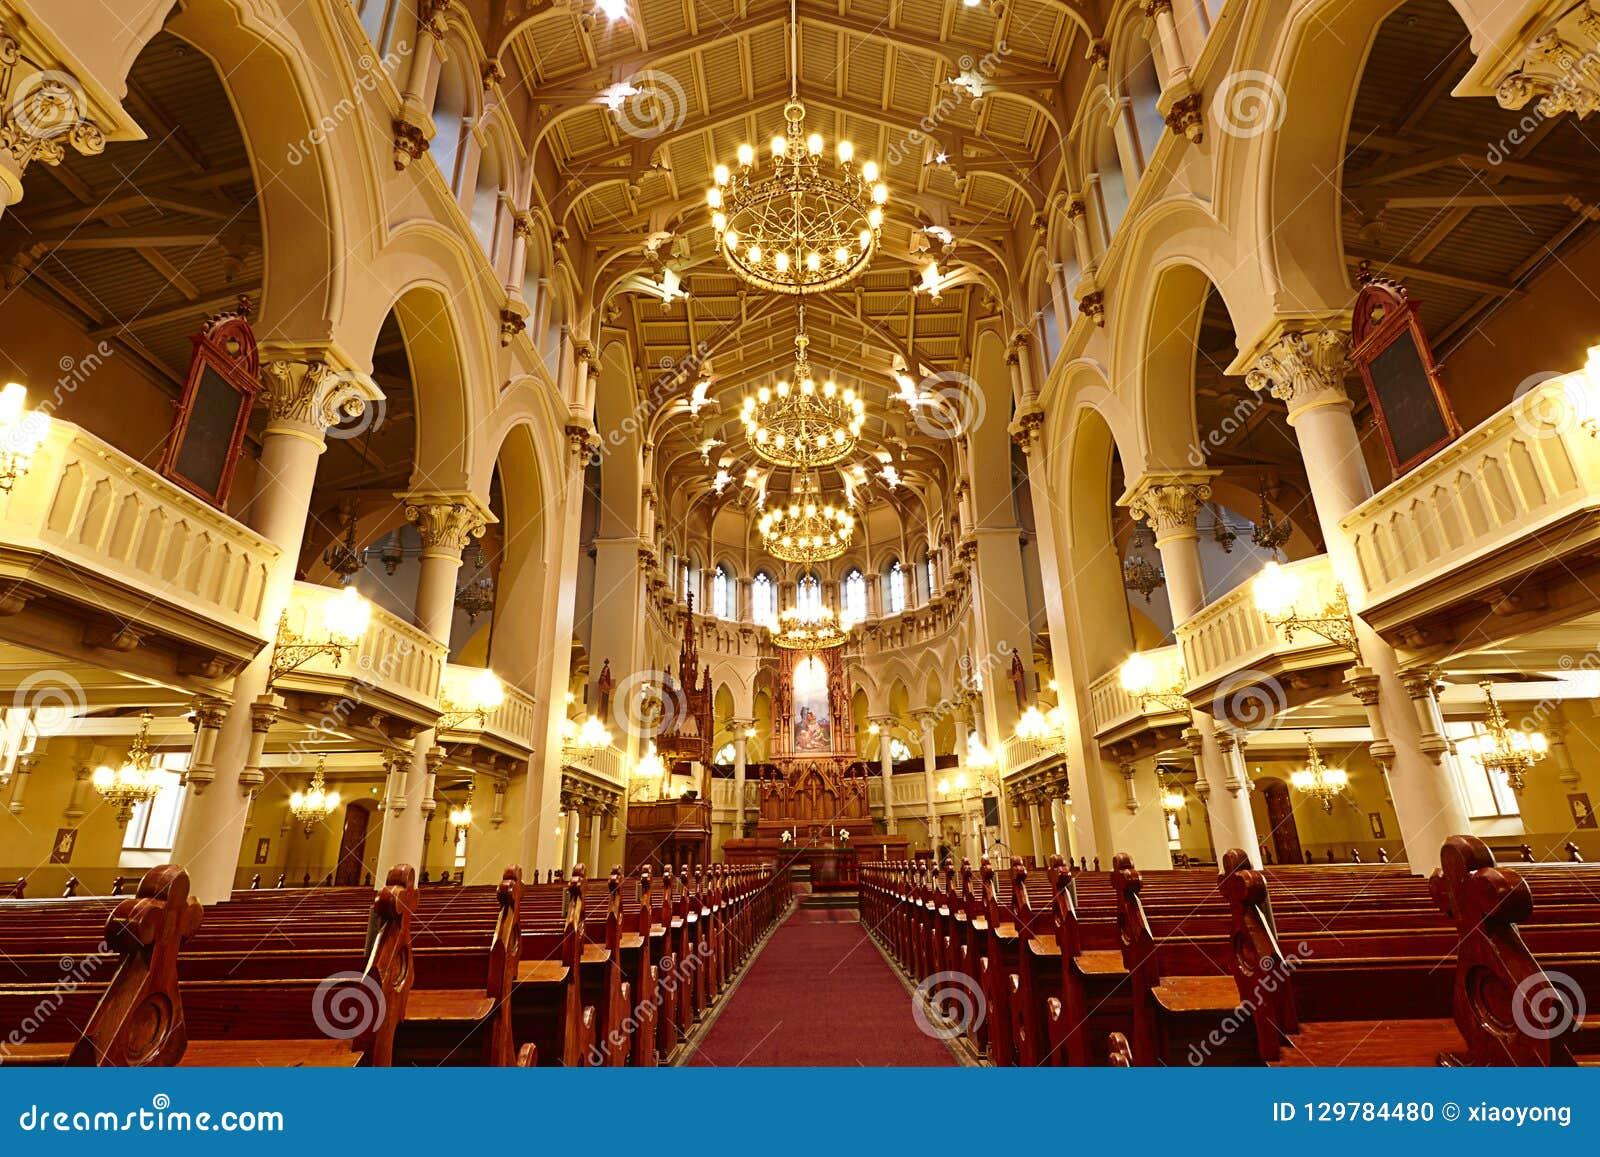 Church in orange atmosphere, Helsinki, Finland